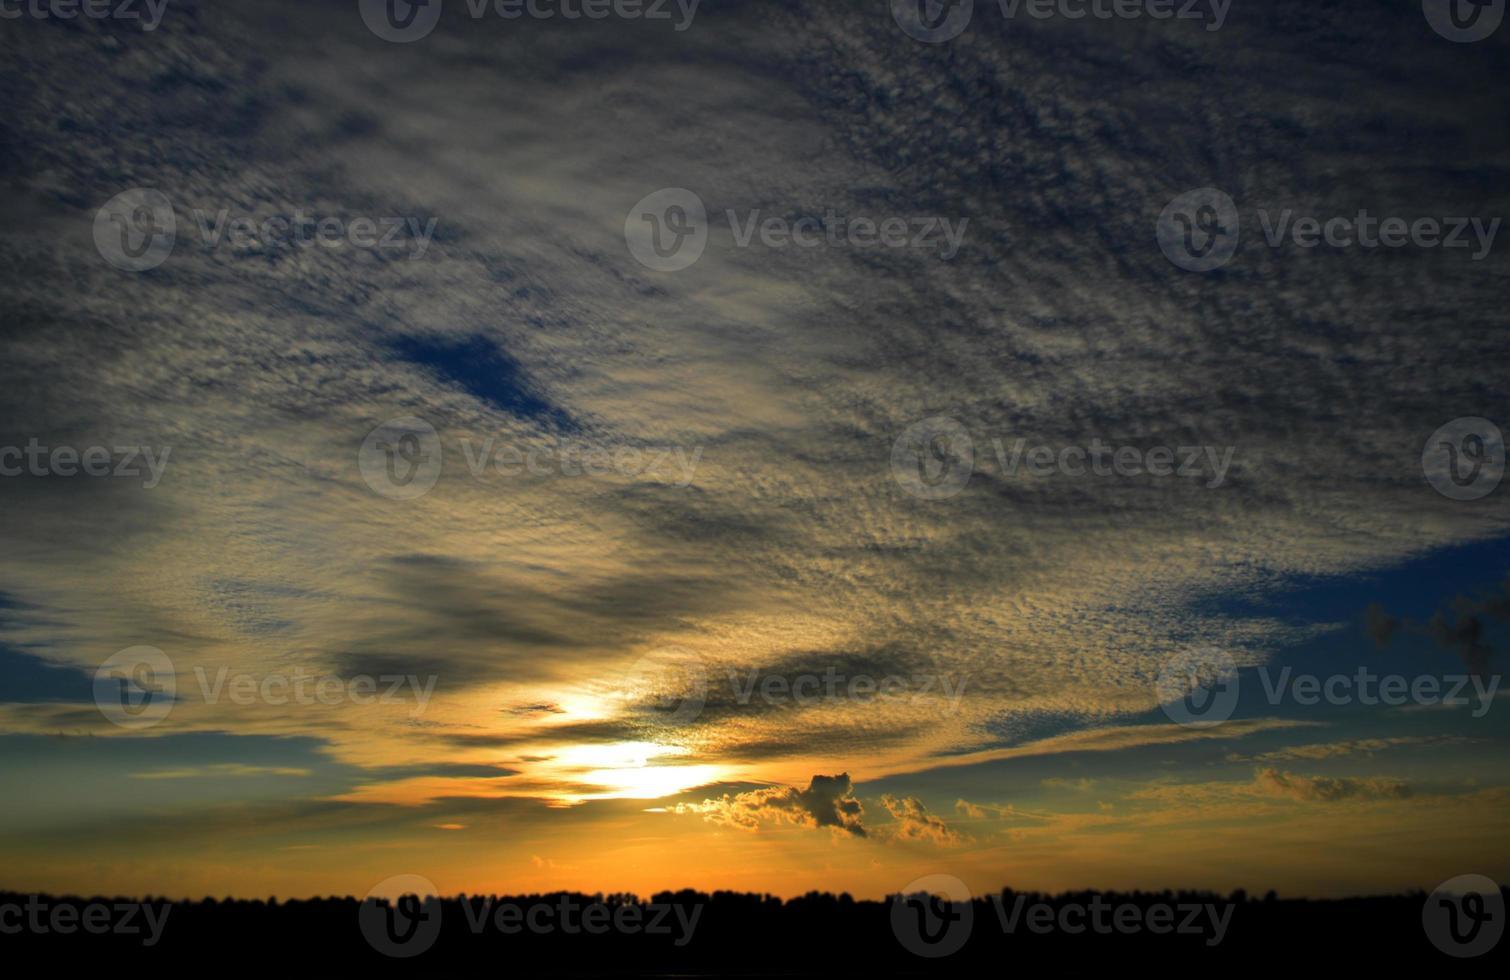 Sonnenuntergang. Schöner Himmel foto